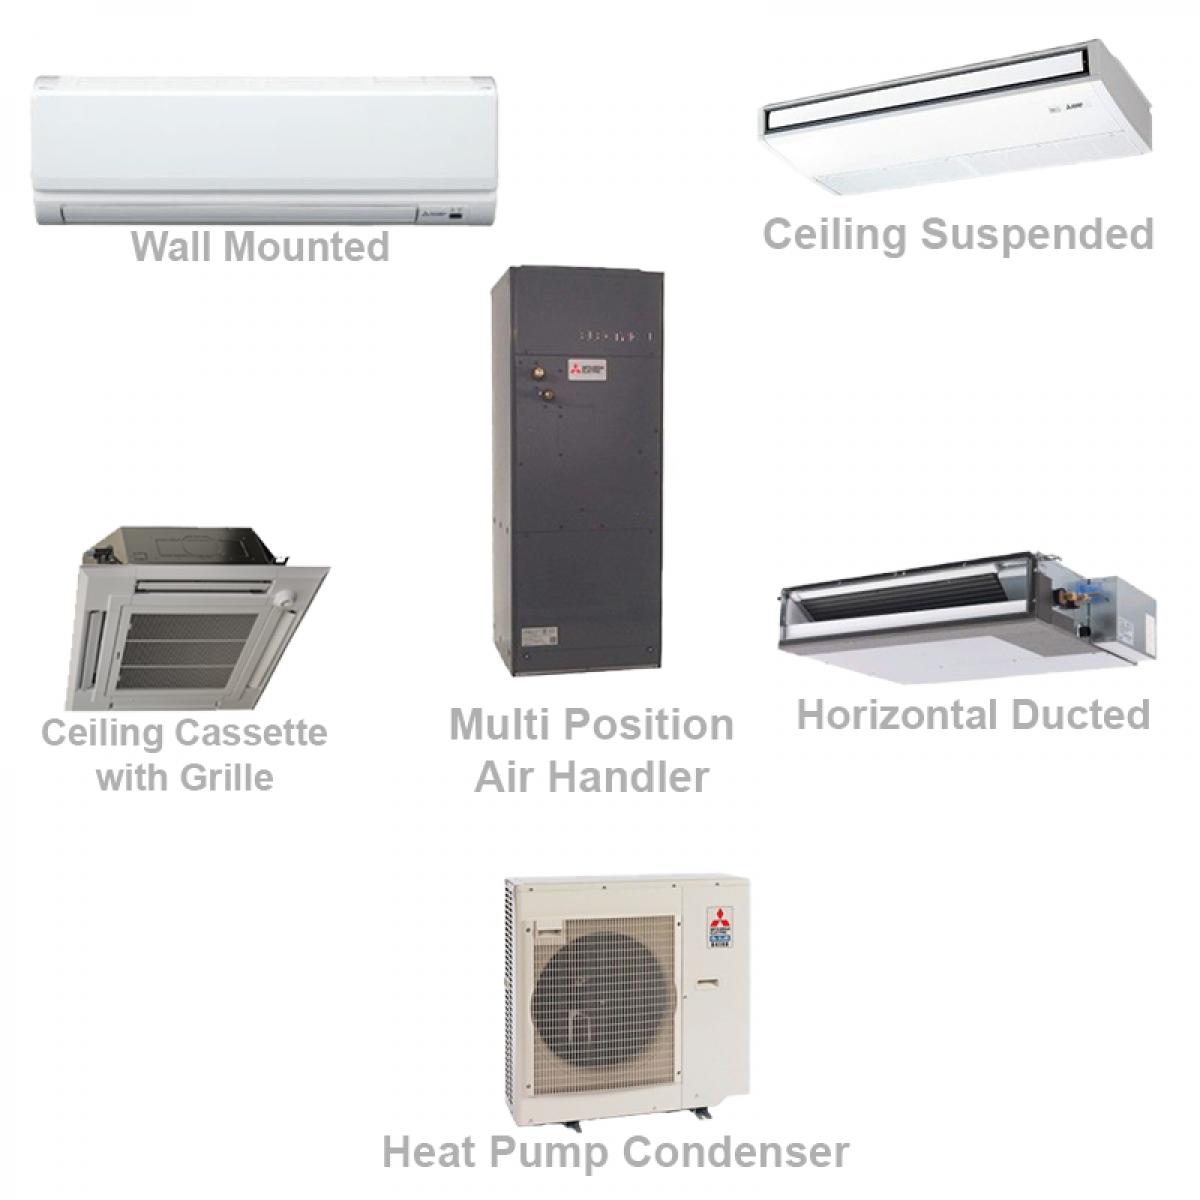 Mitsubishi P Series 24 000 Btu Ductless Heat Pump Air Conditioner